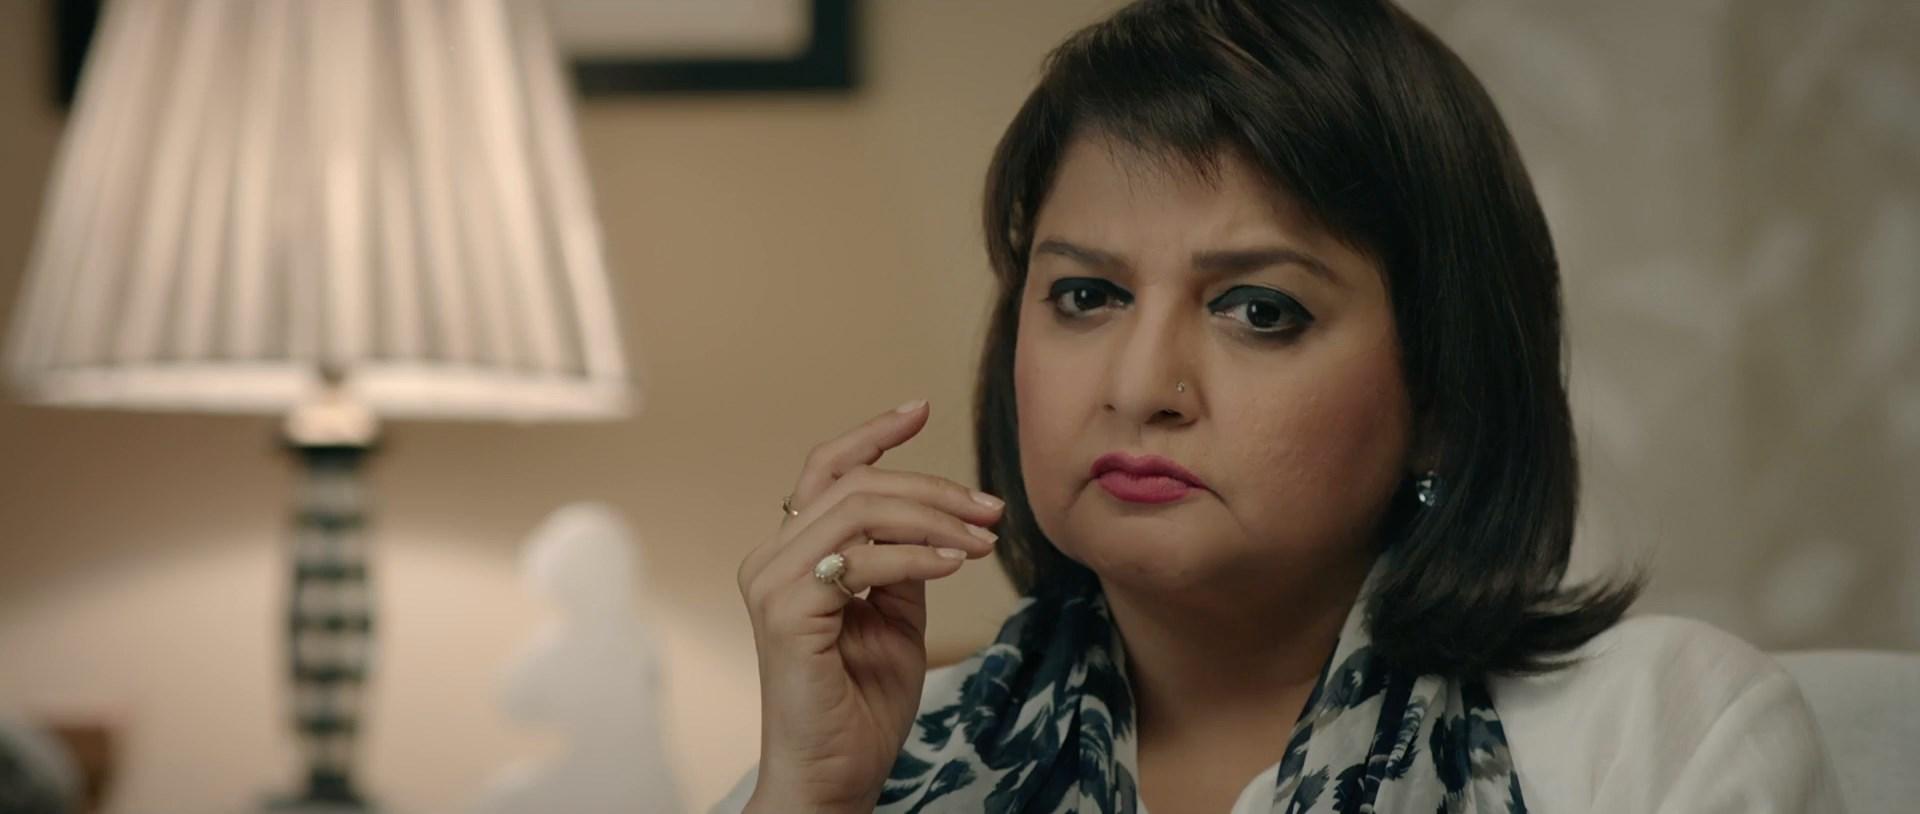 KAYA The Mystery Unfolds 2021 Bengali Movie 1080p WEB DL x264 AAC.mp4 snapshot 00.13.45.541